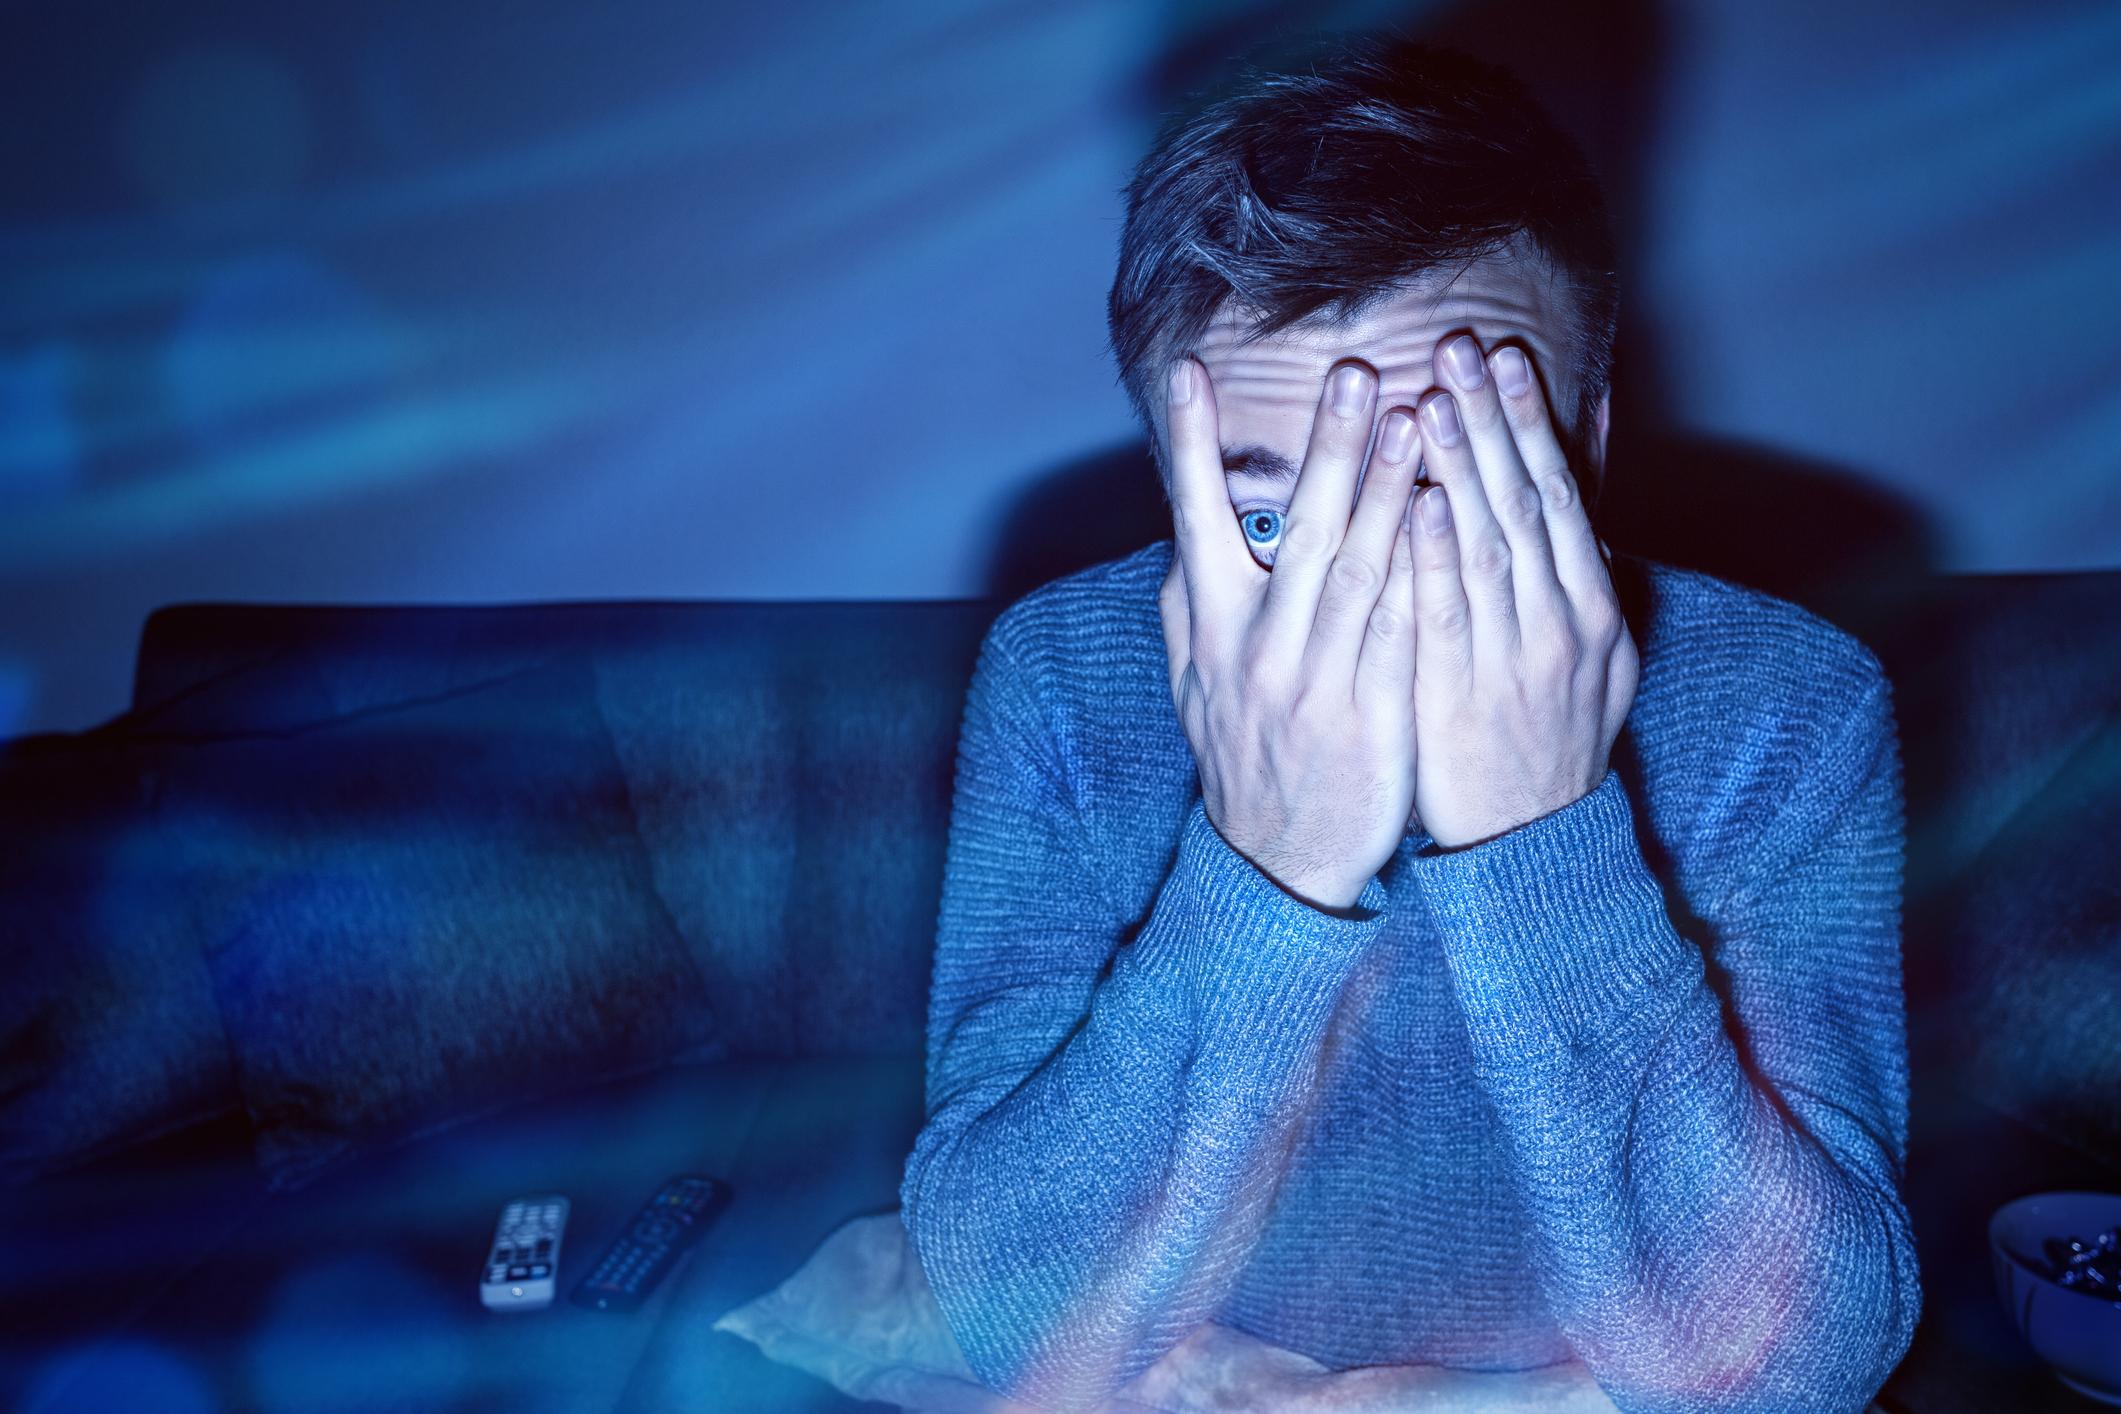 Man peeping between fingers at a screen